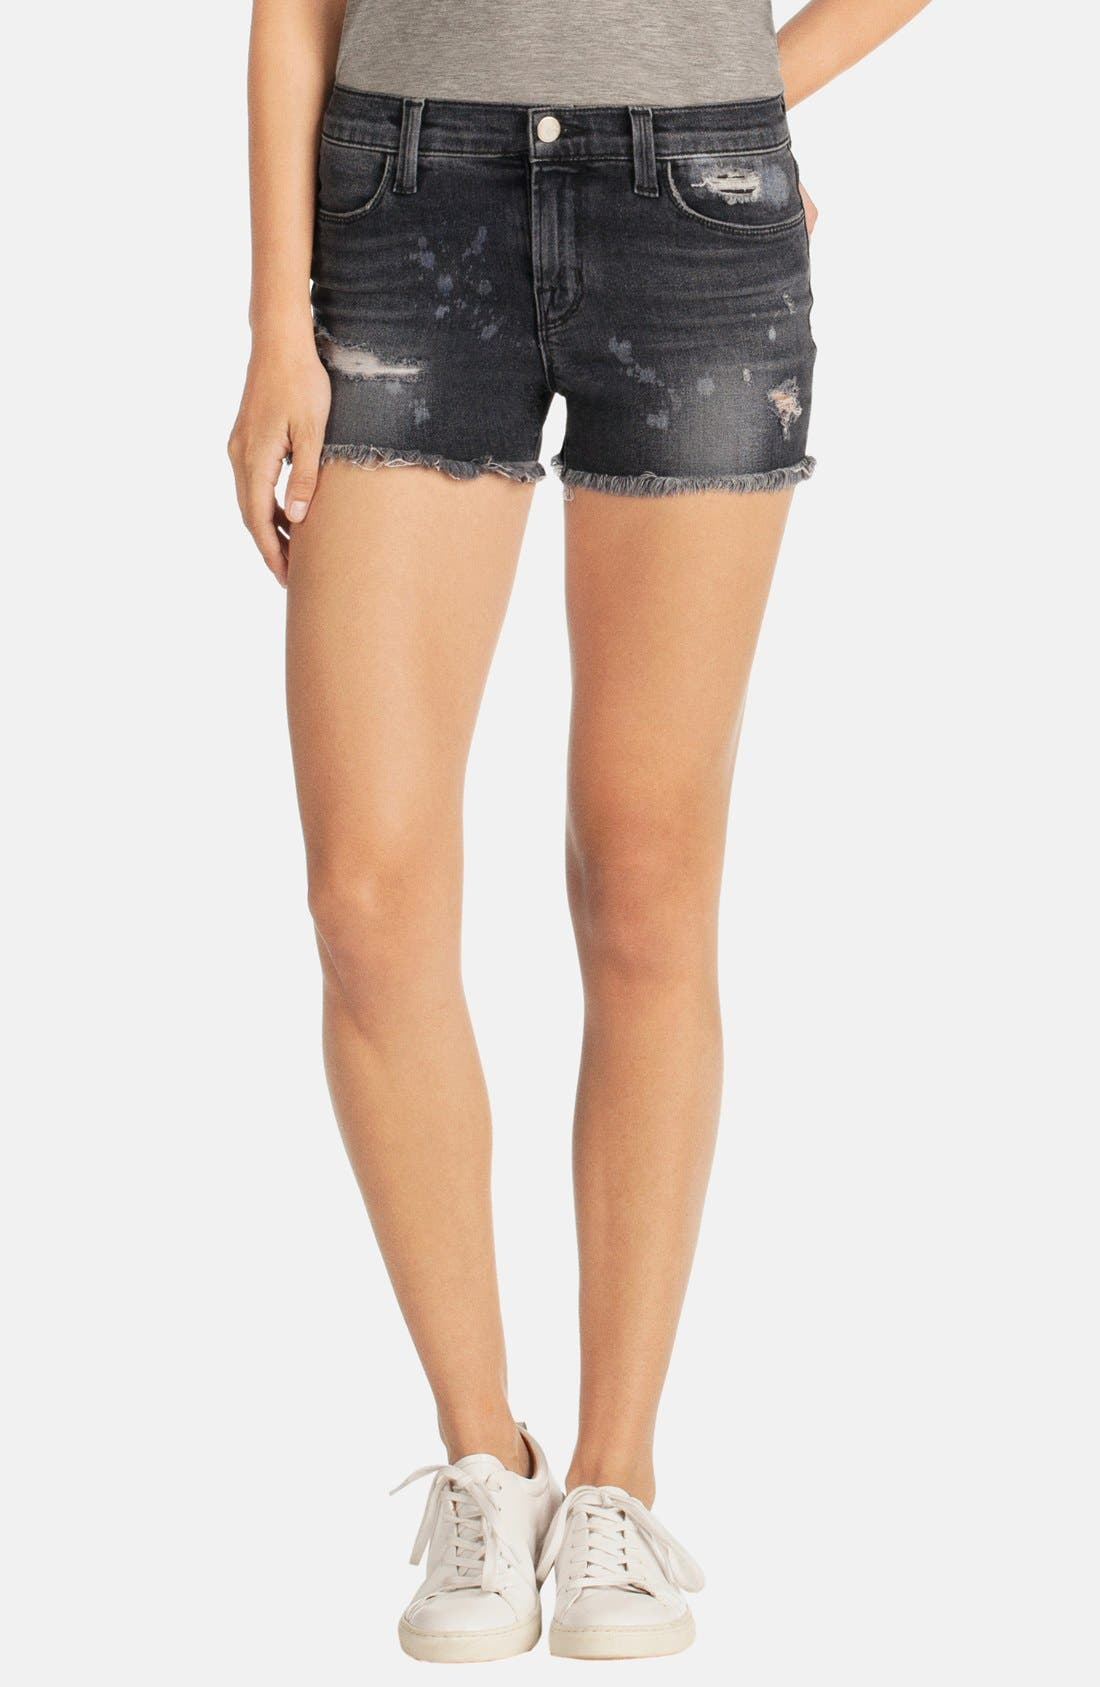 Alternate Image 1 Selected - J Brand 'Mia' Denim Cutoff Shorts (Vagabond)